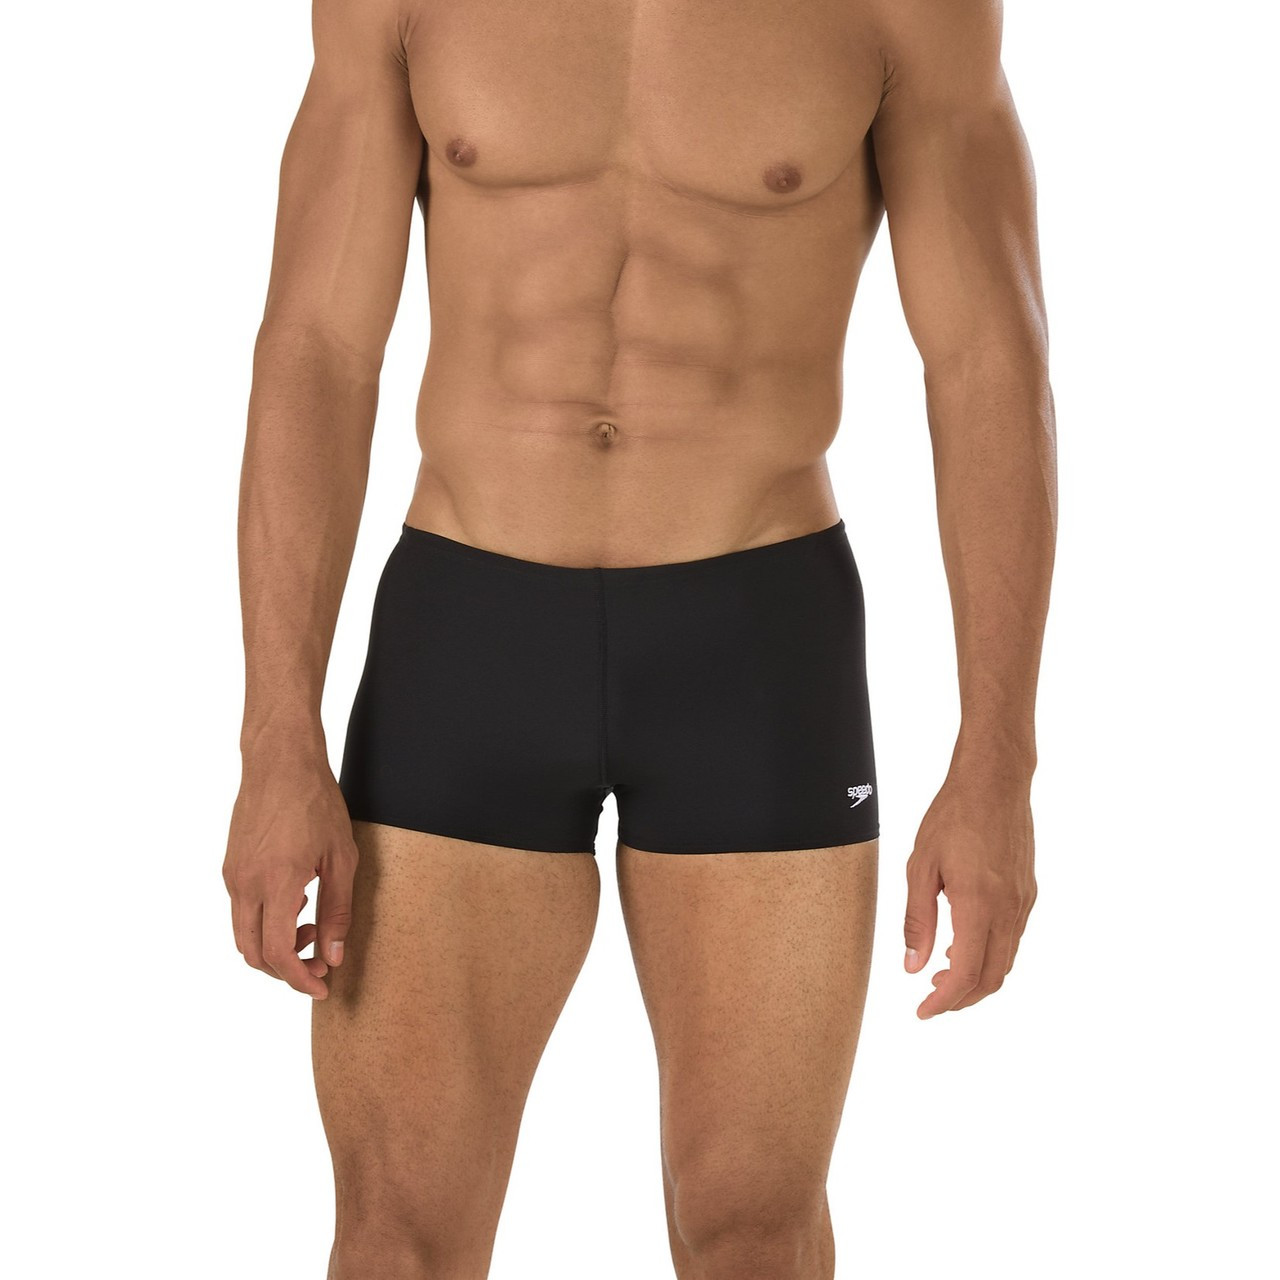 f85cd0bd57 Speedo Men's Solid Endurance Square Leg